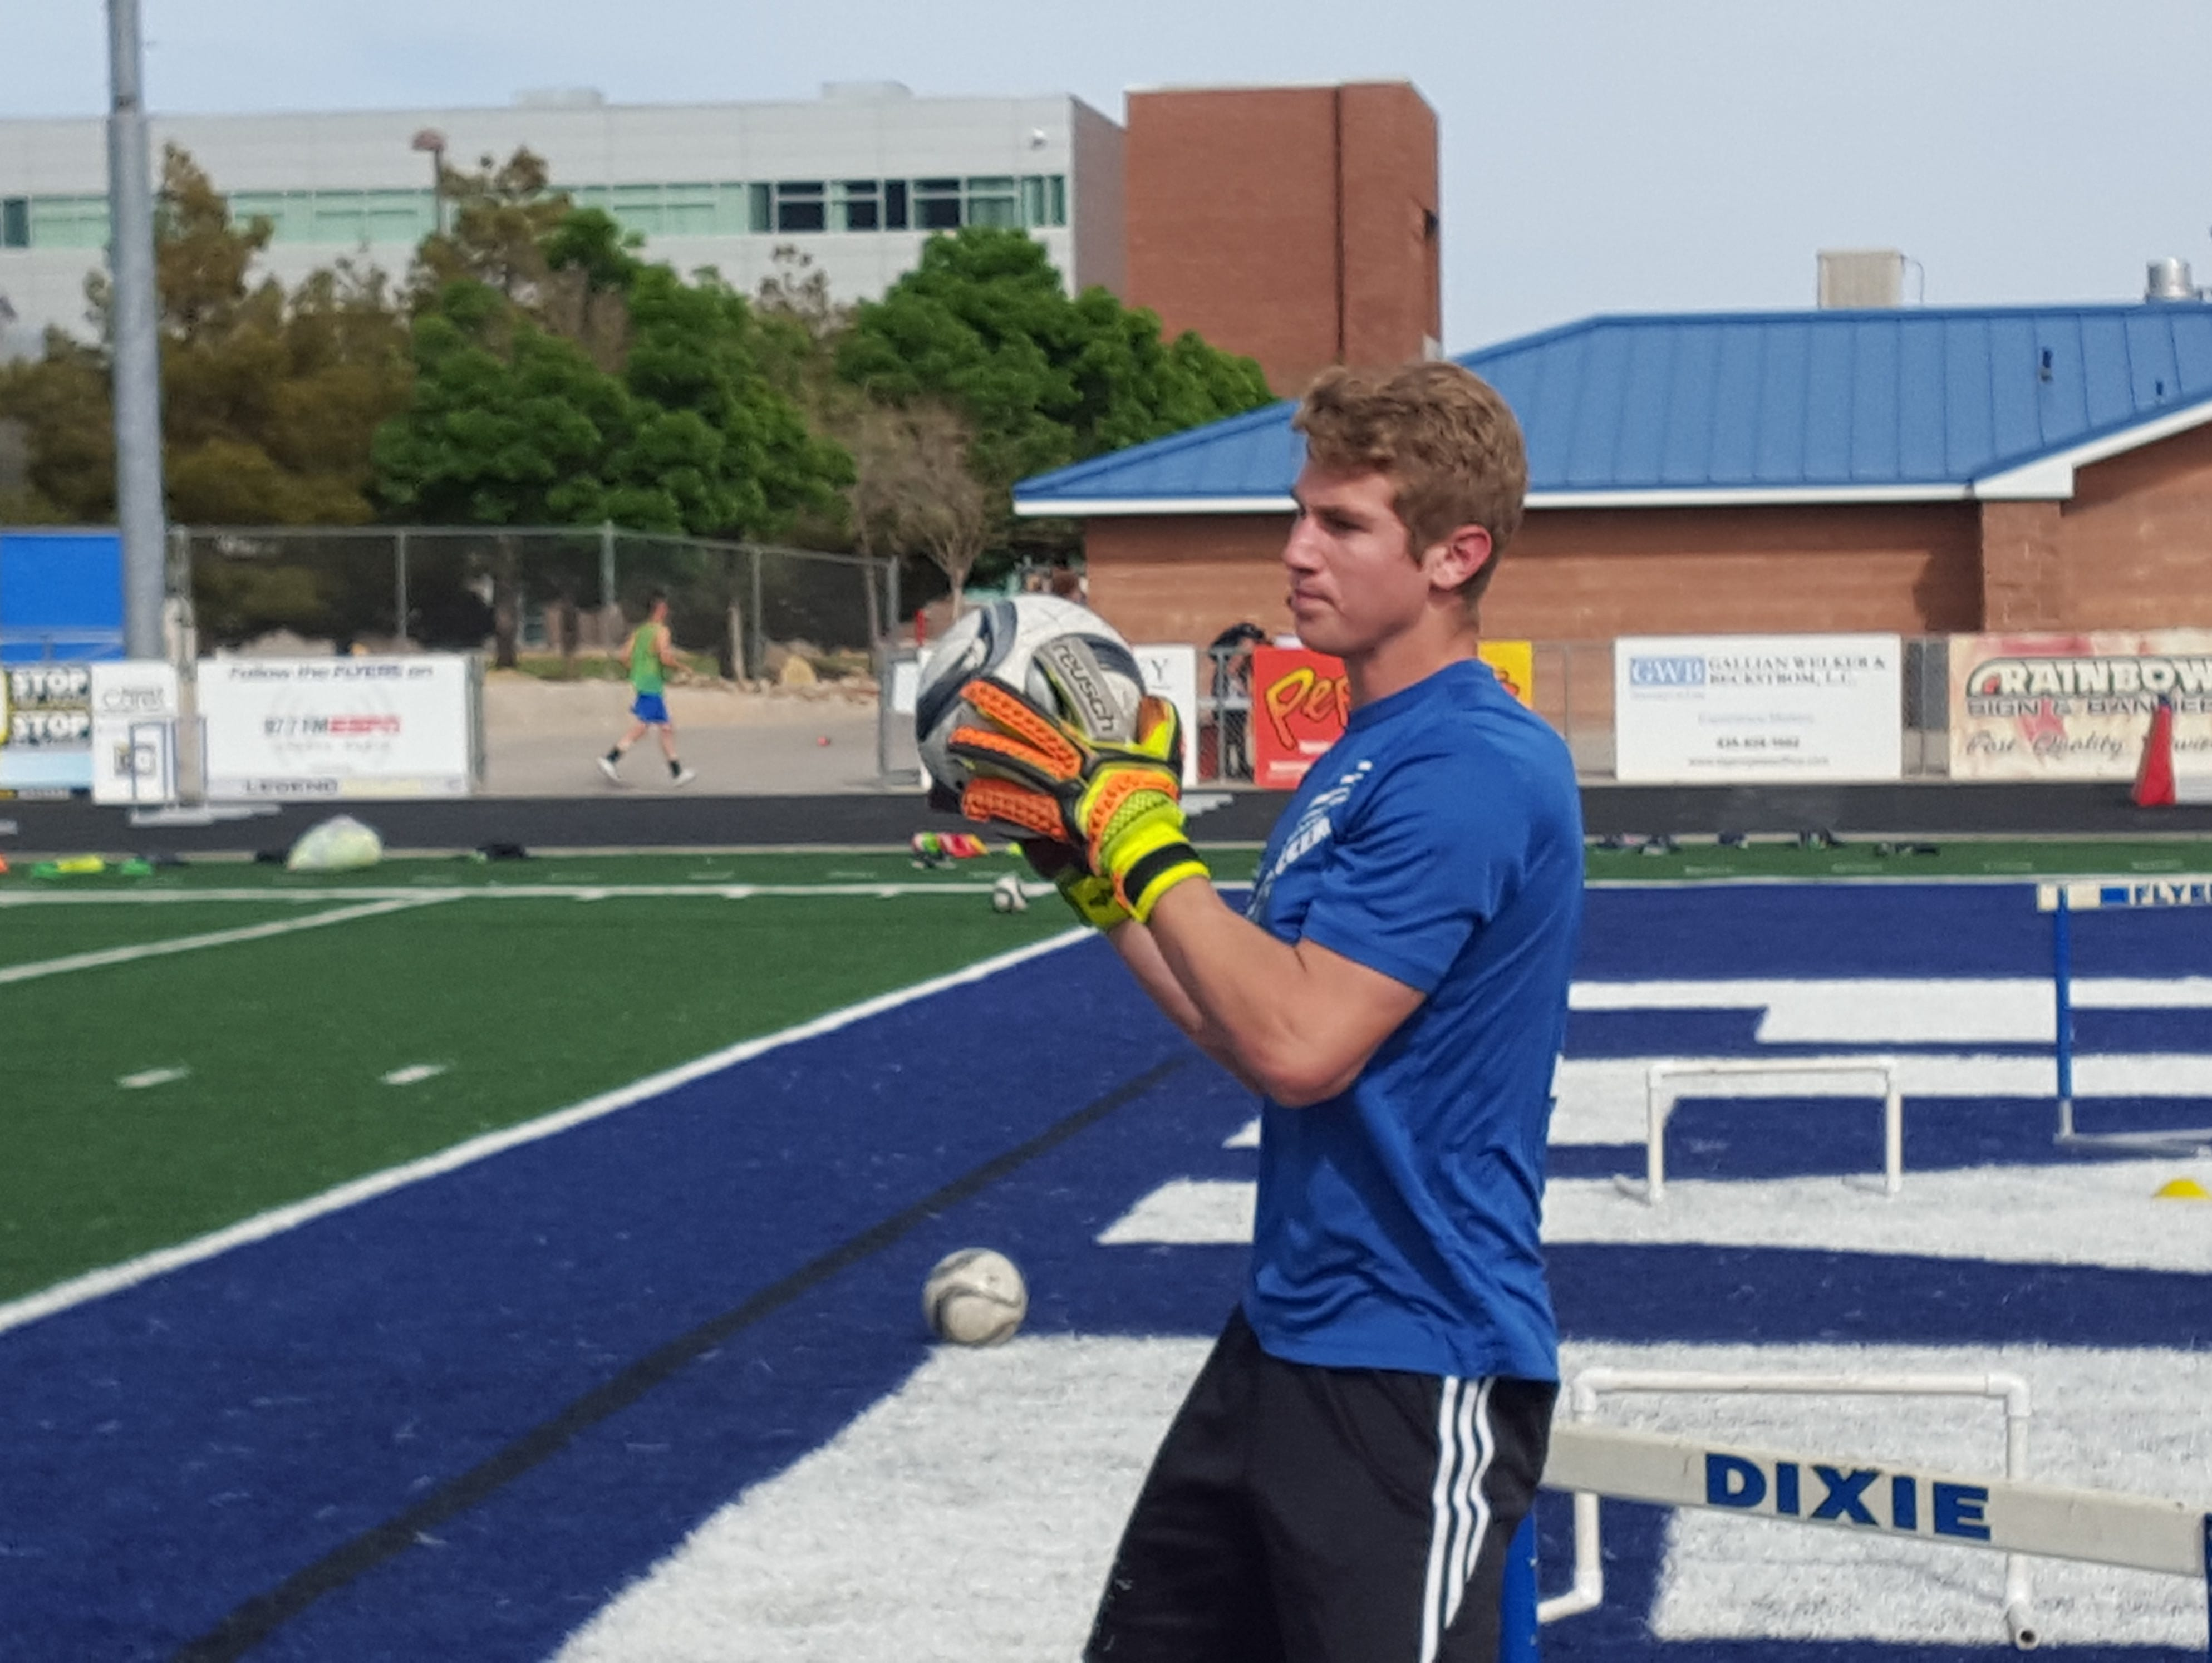 Dixie keeper Ethan Poulton trains during a practice April 6, 2016.